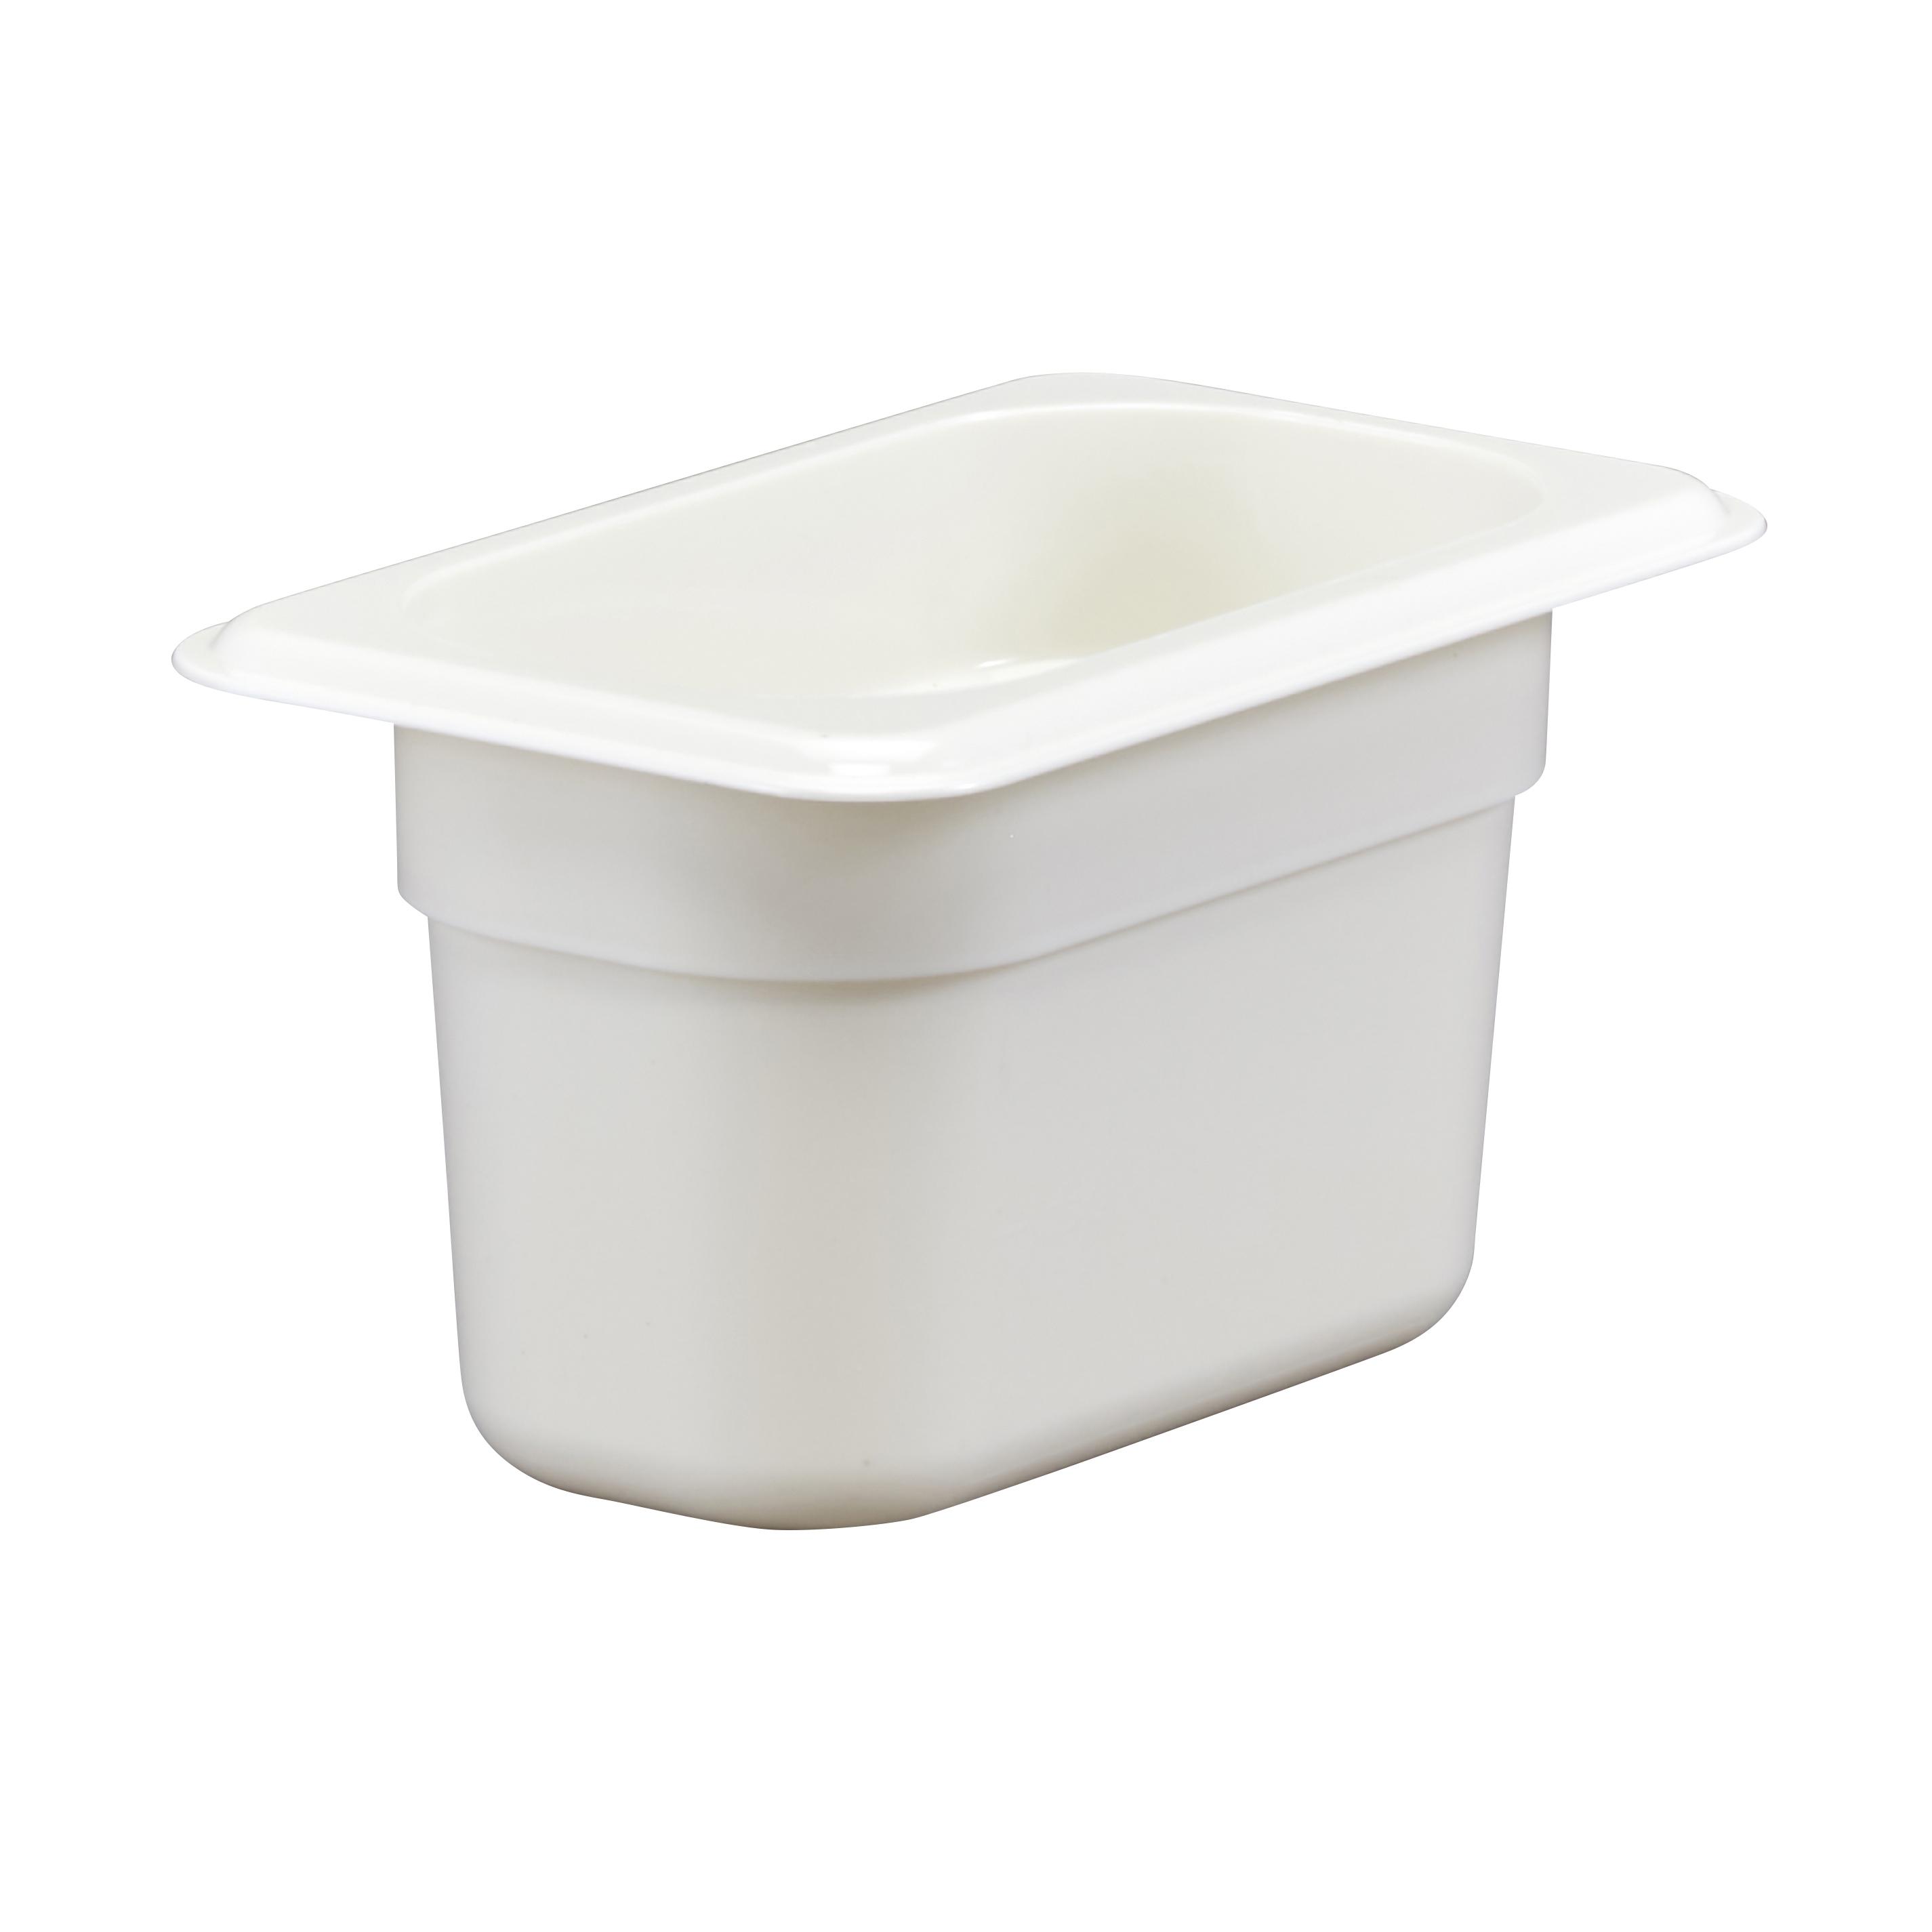 Cambro 94CW148 food pans